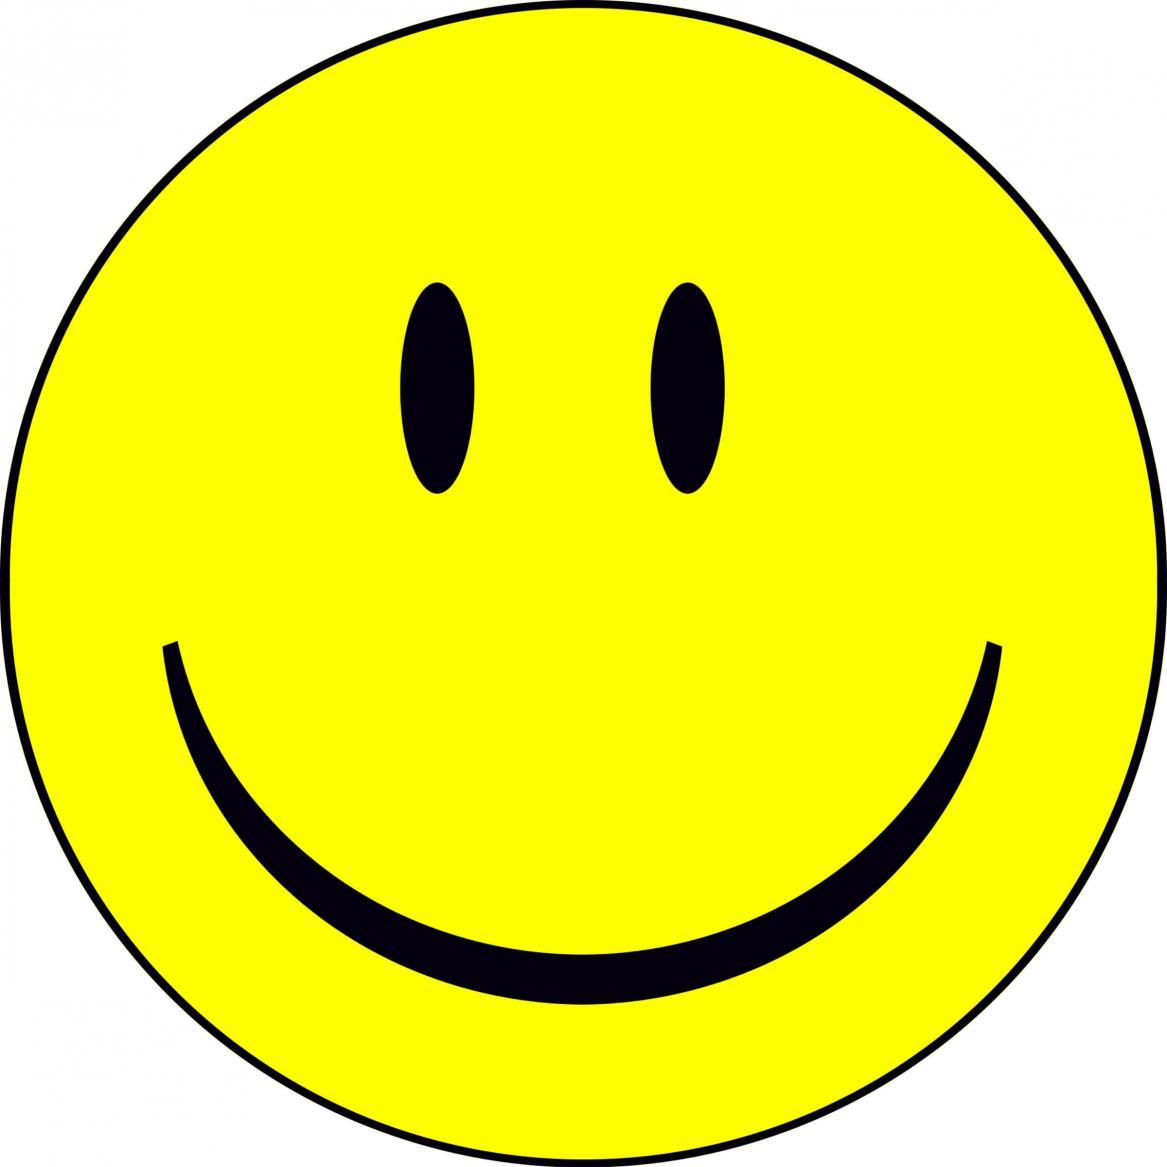 smiley face clip art emotions-smiley face clip art emotions-14